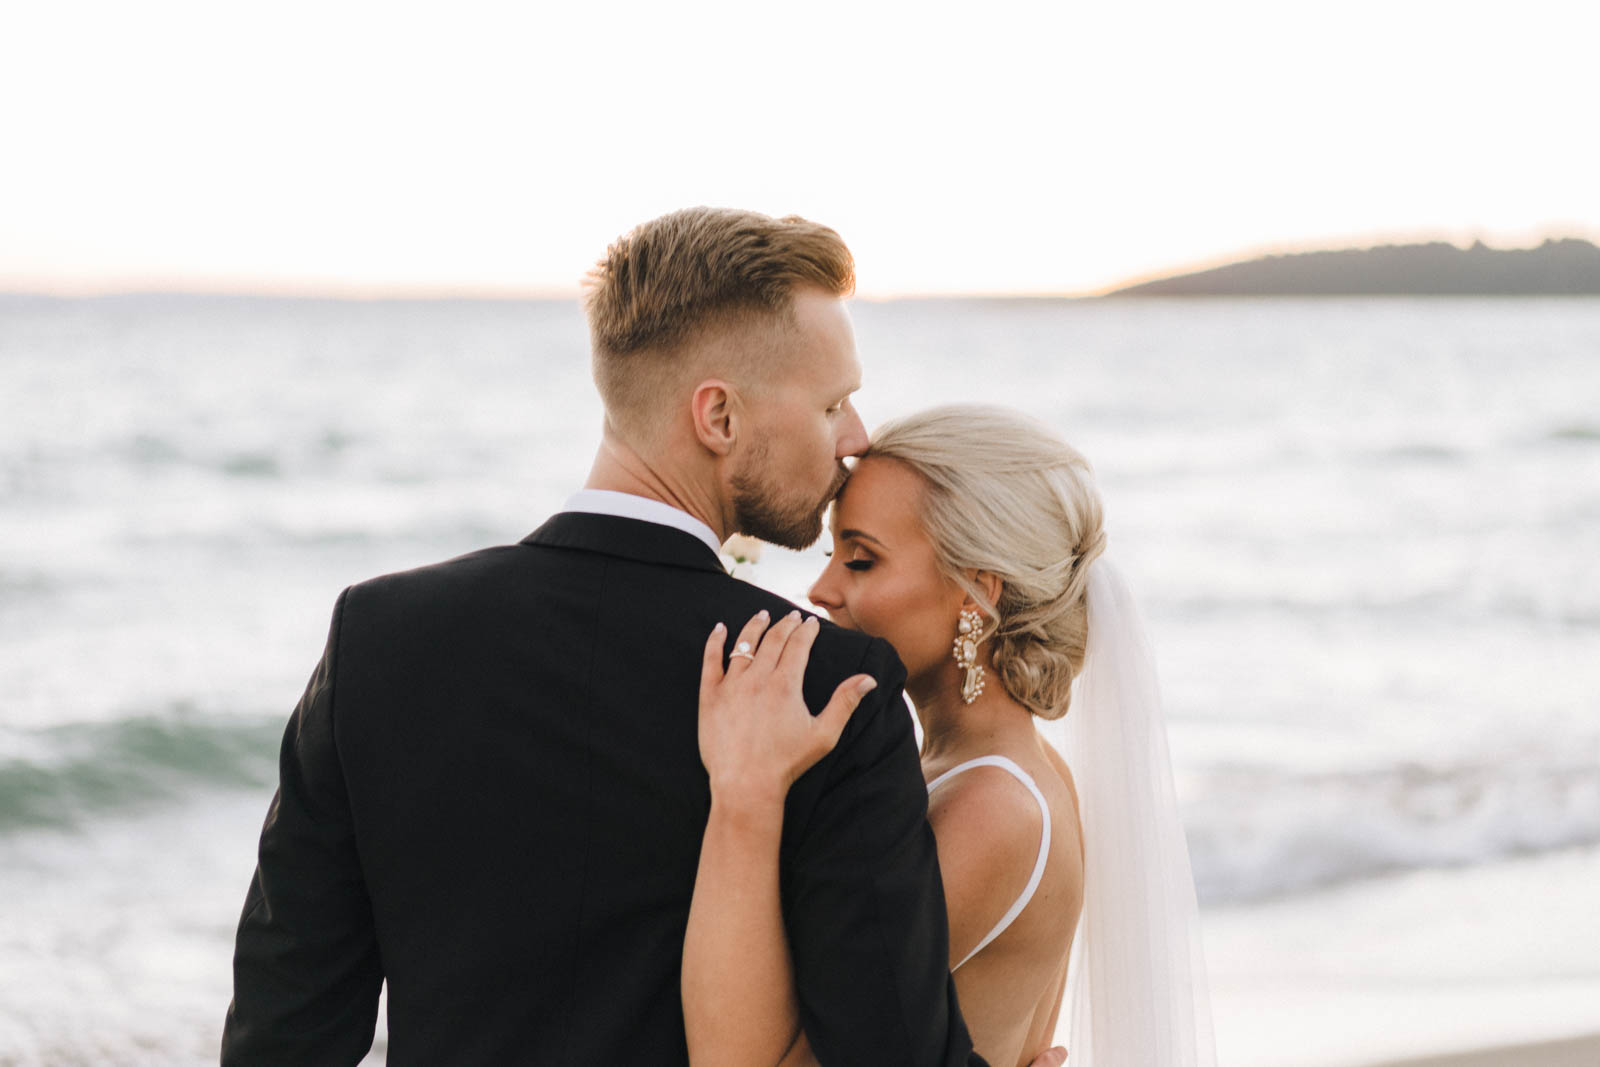 newfound-k-s-hilton-taupo-wedding-photographer-096